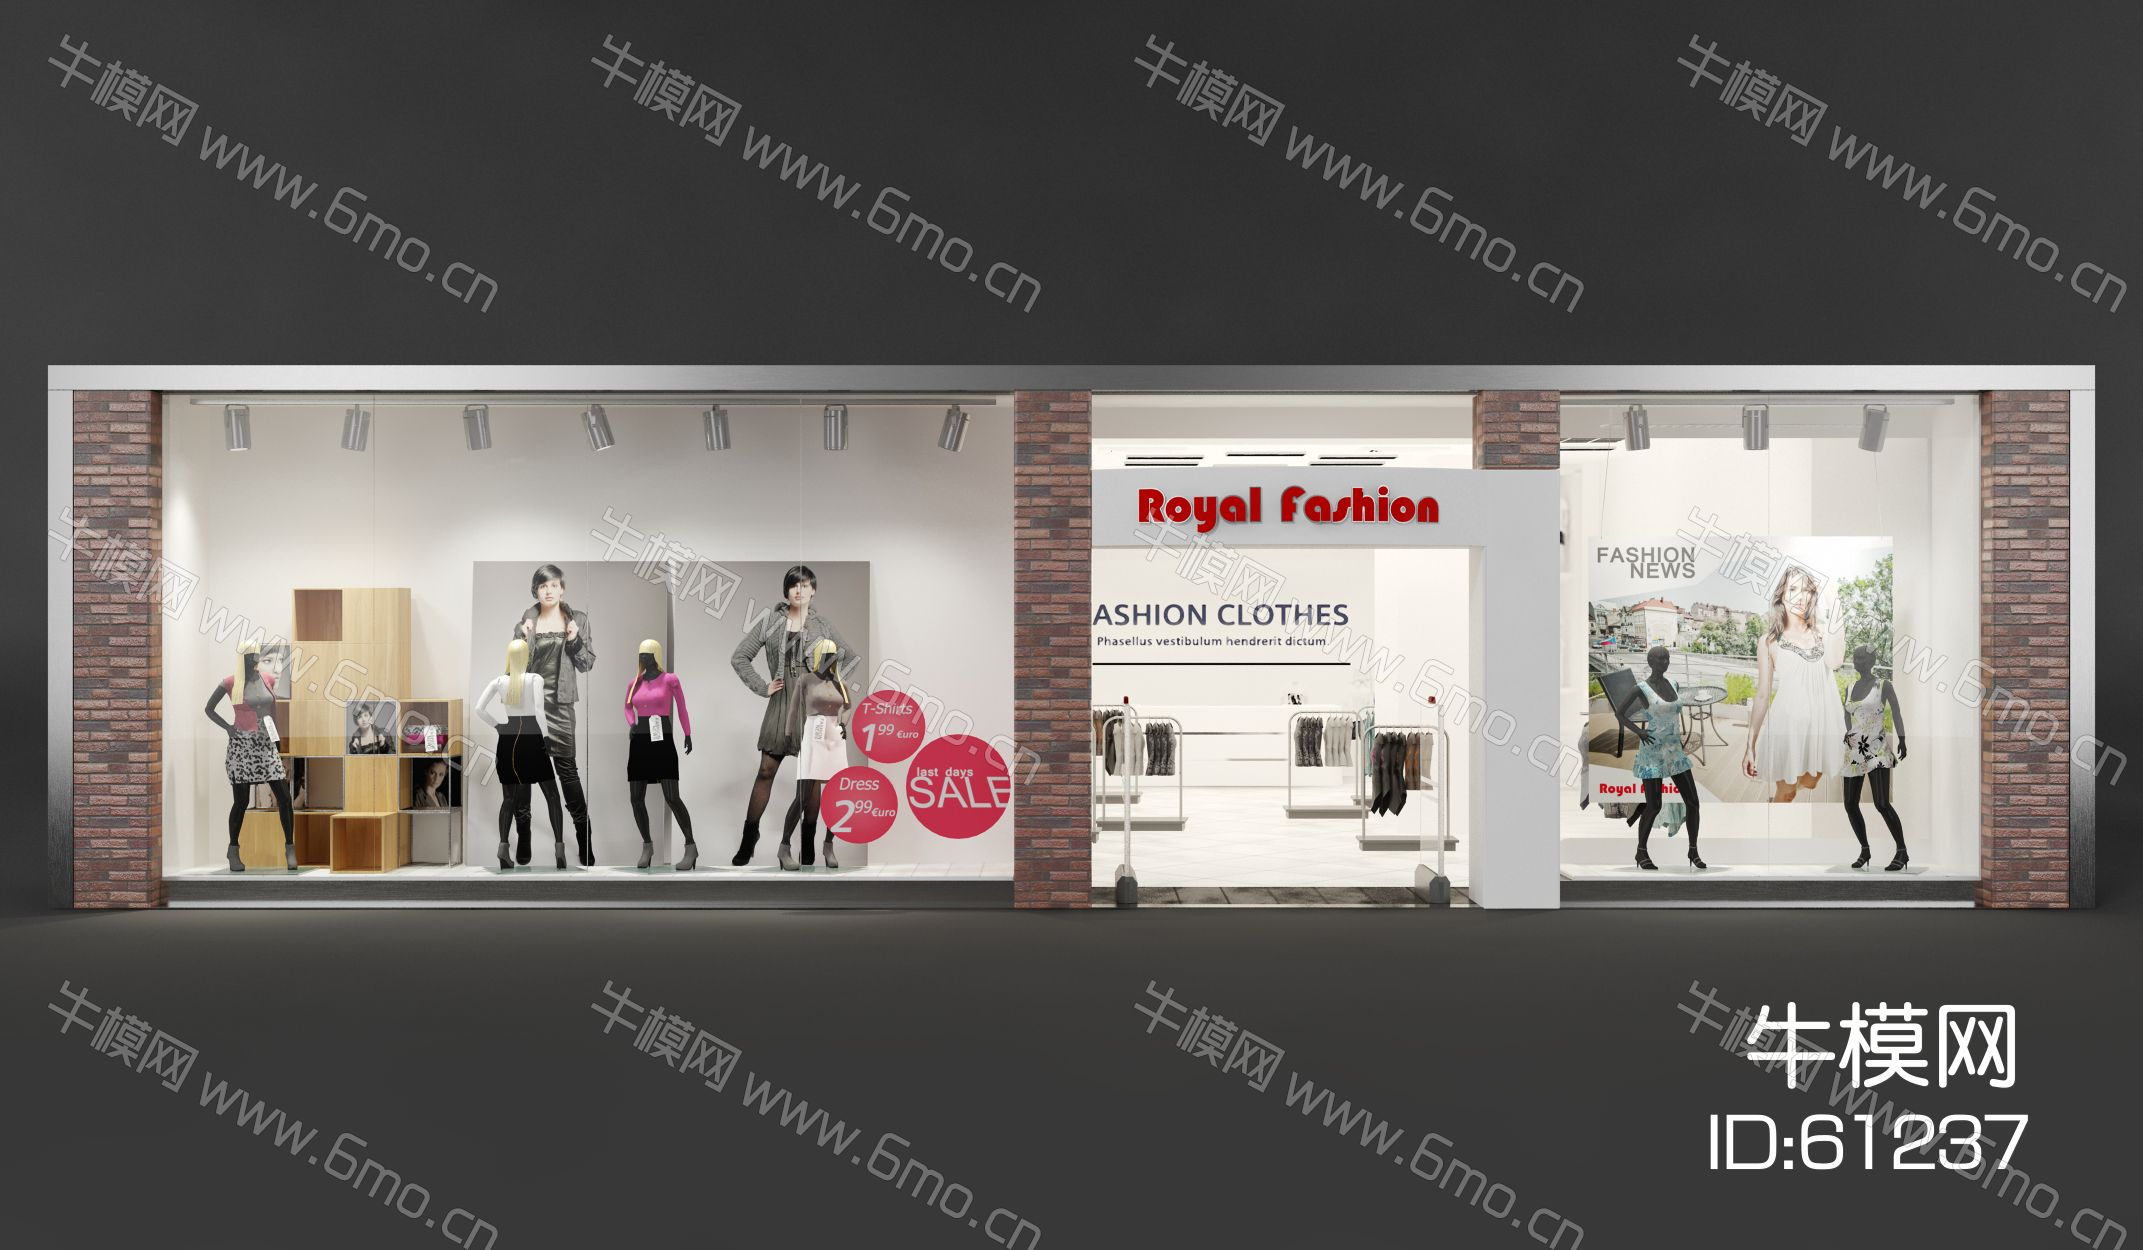 3d透明玻璃材质_现代橱窗,橱窗,商业橱窗,商铺橱窗,店面橱窗,店铺橱窗3D ...